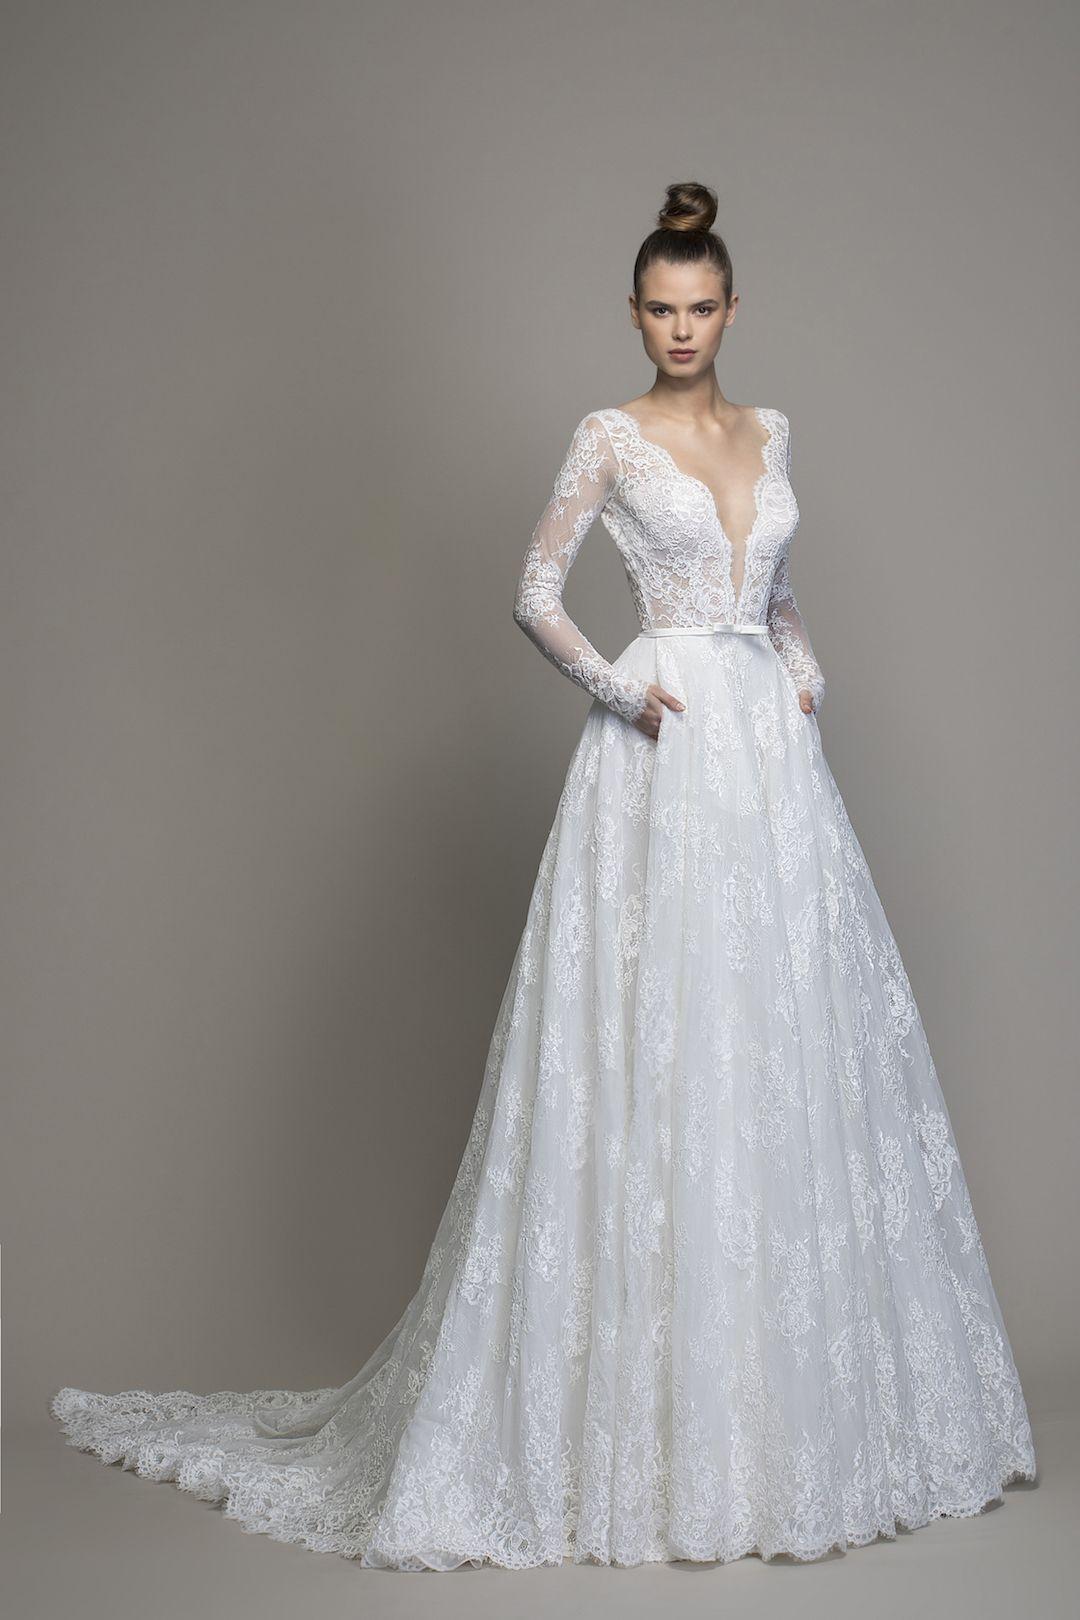 Long Sleeve Lace A Line Wedding Dress Kleinfeld Bridal Wedding Dresses Kleinfeld Wedding Dress Sleeves Pnina Tornai Wedding Dress